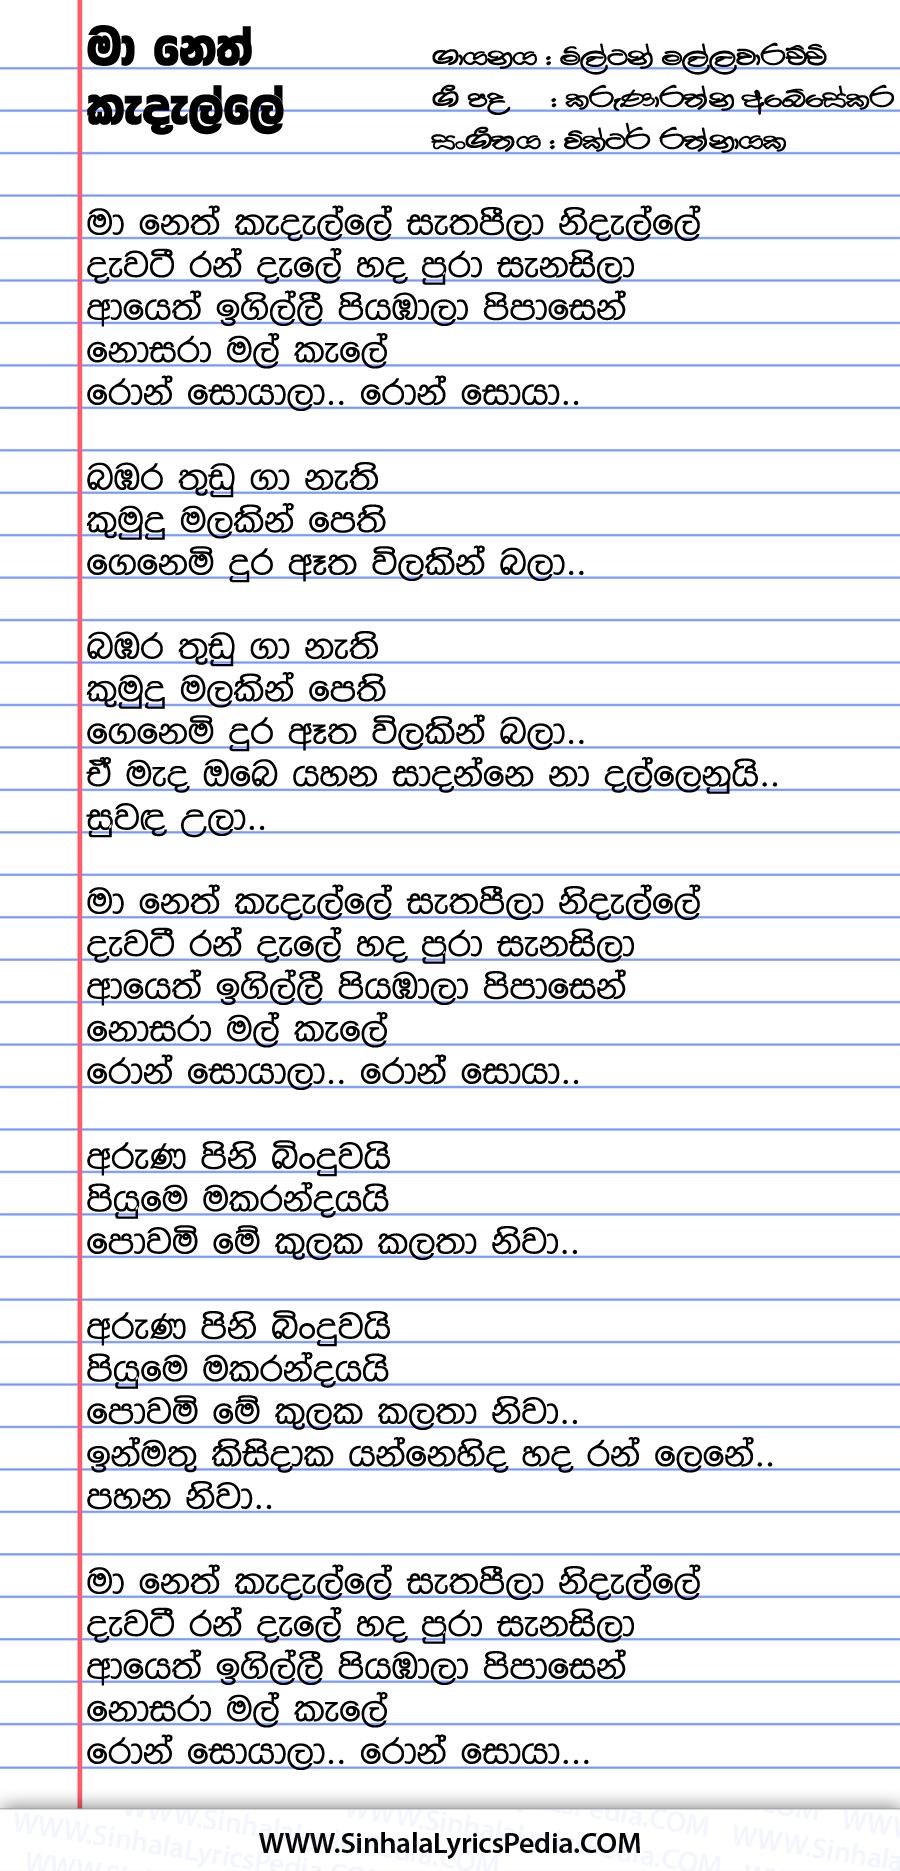 Ma Neth Kadalle Sathapeela Nidalle Song Lyrics